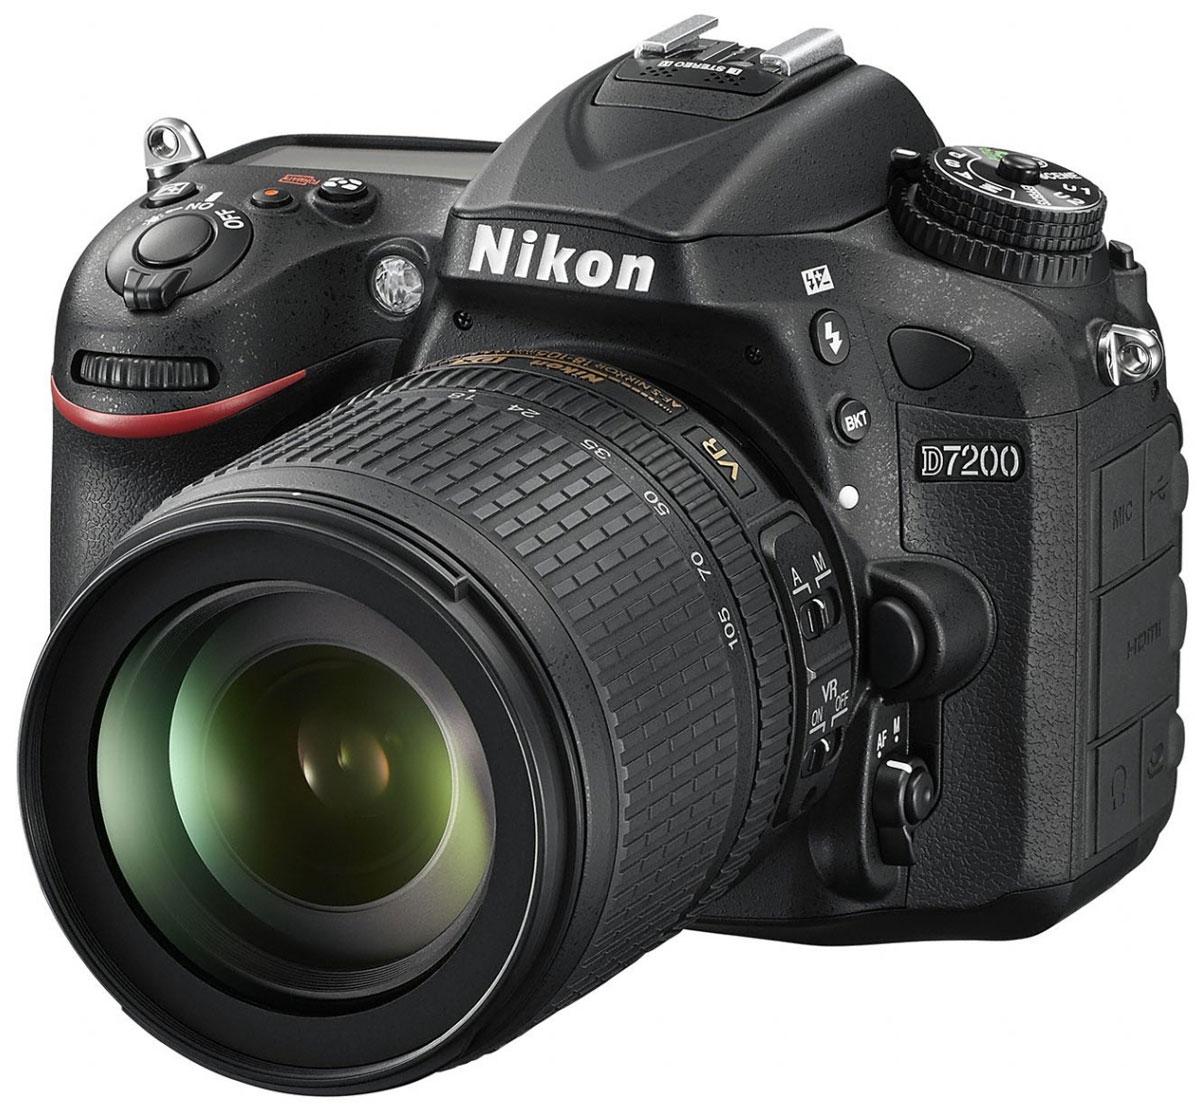 Nikon D7200 Kit 18-105 VR, Black цифровая зеркальная фотокамера nikon d3400 kit 18 105 vr black